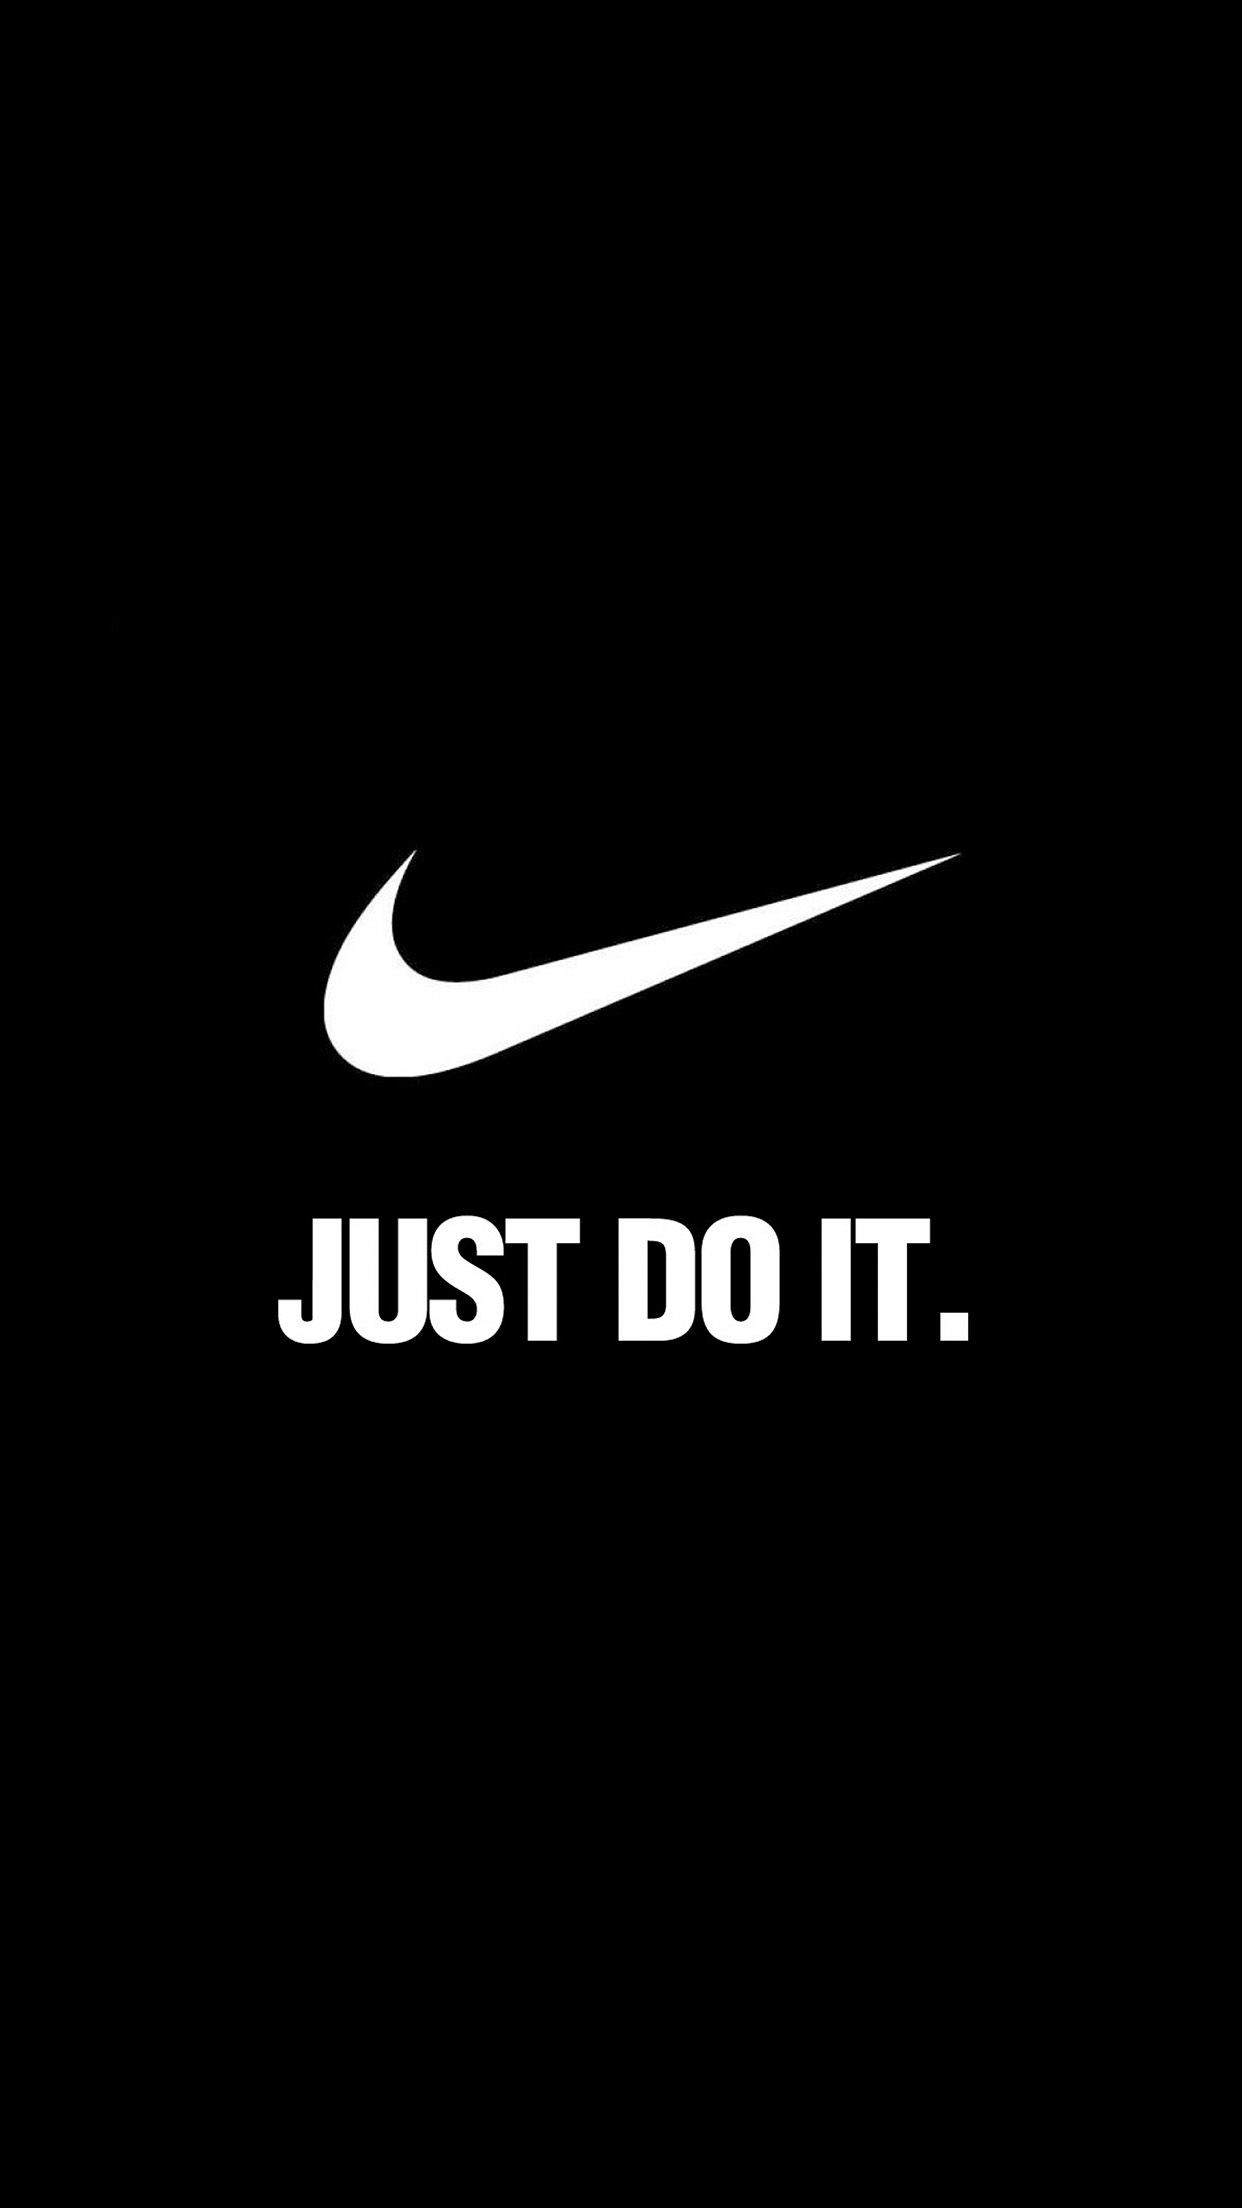 Res: 1242x2208, Logo Nike Brand Just Do It Motivation Sport Minimalism Black White HD  iPhone 6 plus Wallpaper